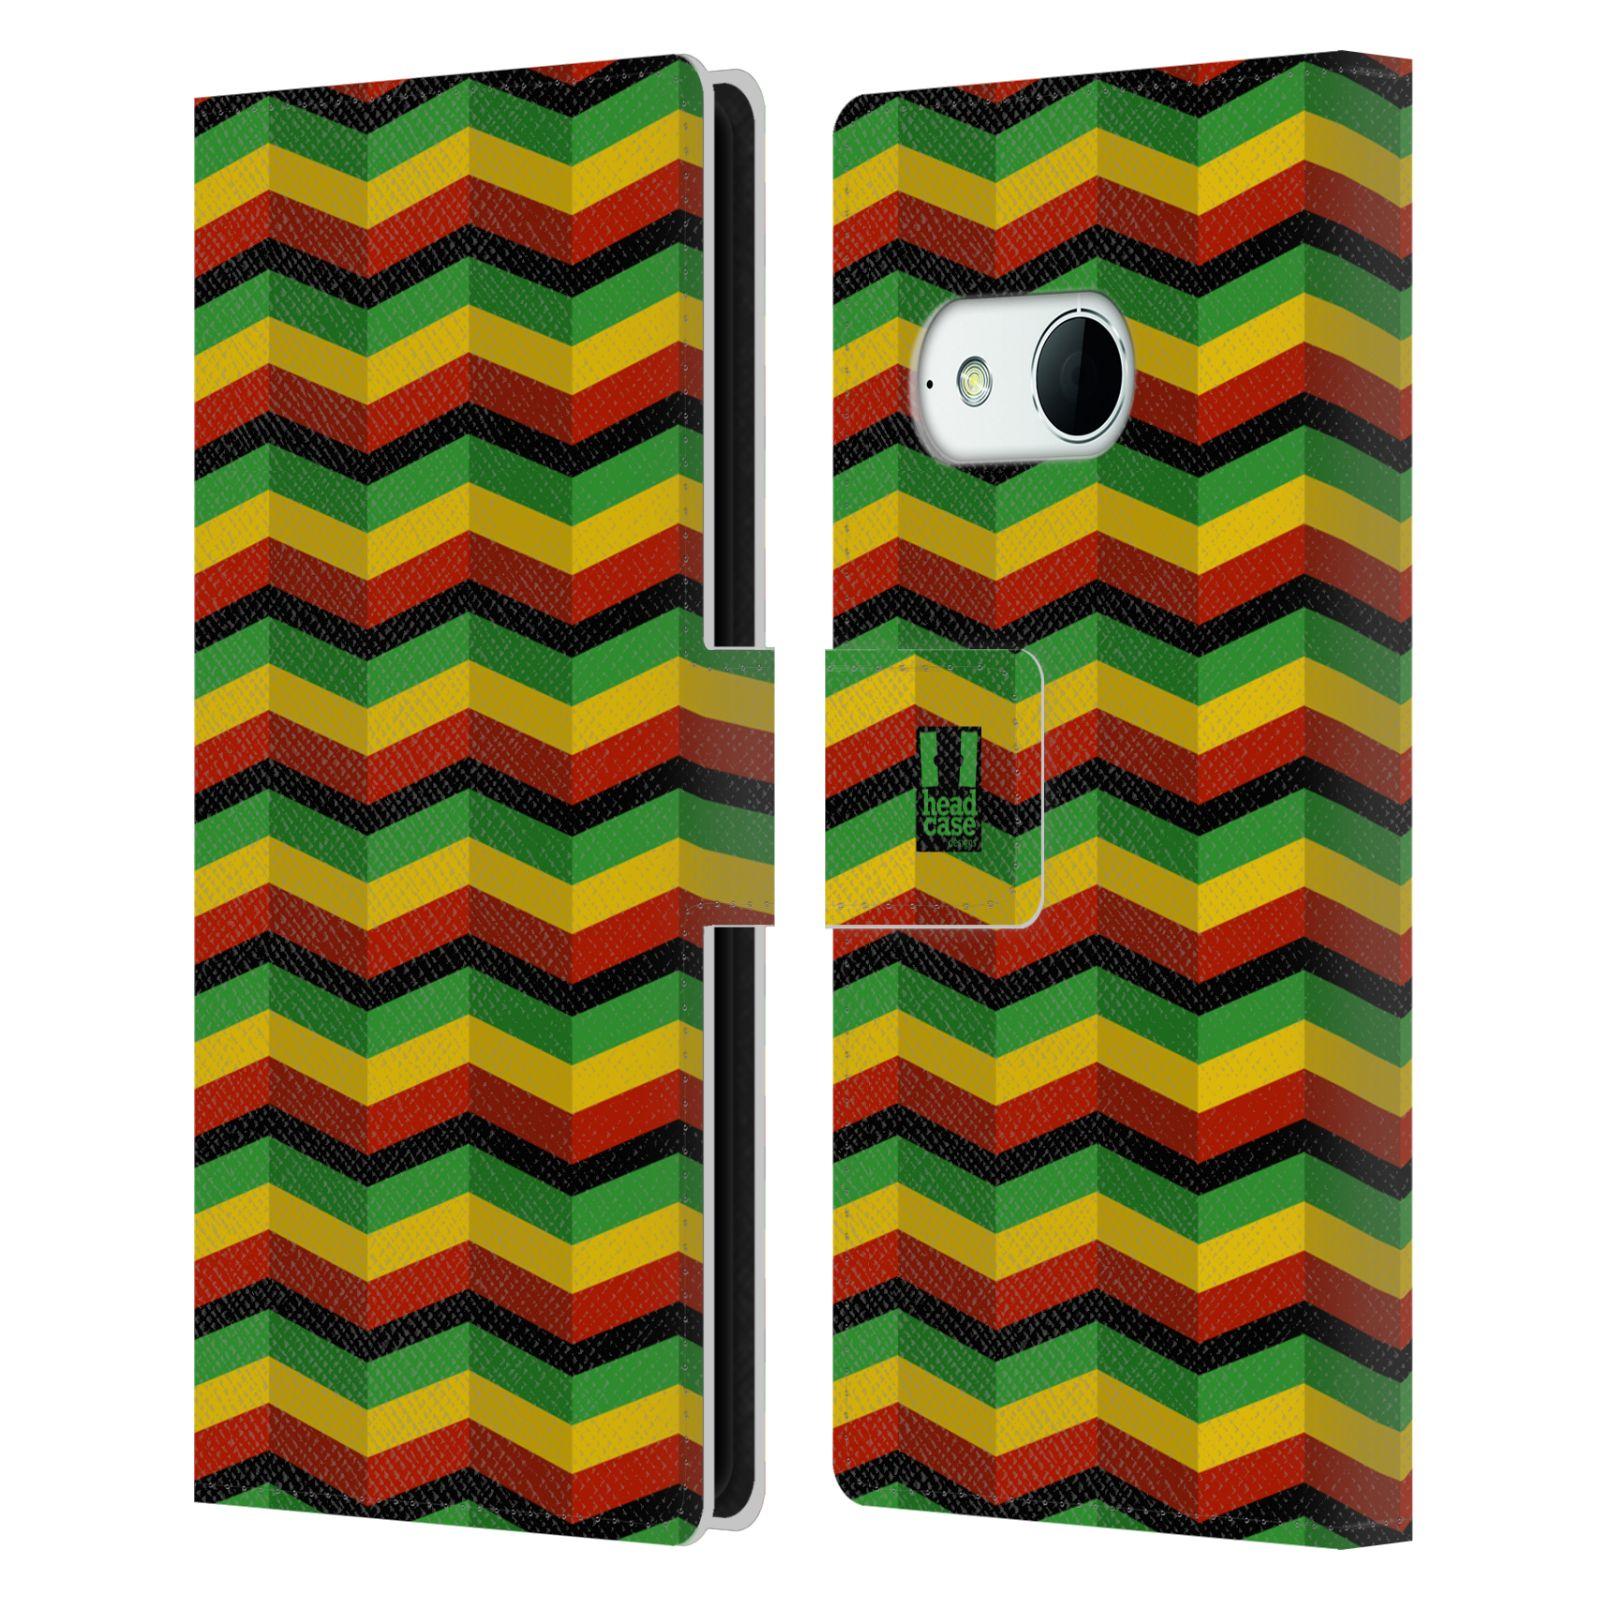 HEAD CASE Flipové pouzdro pro mobil HTC ONE MINI 2 (M8) Rastafariánský motiv Jamajka CHEVRON